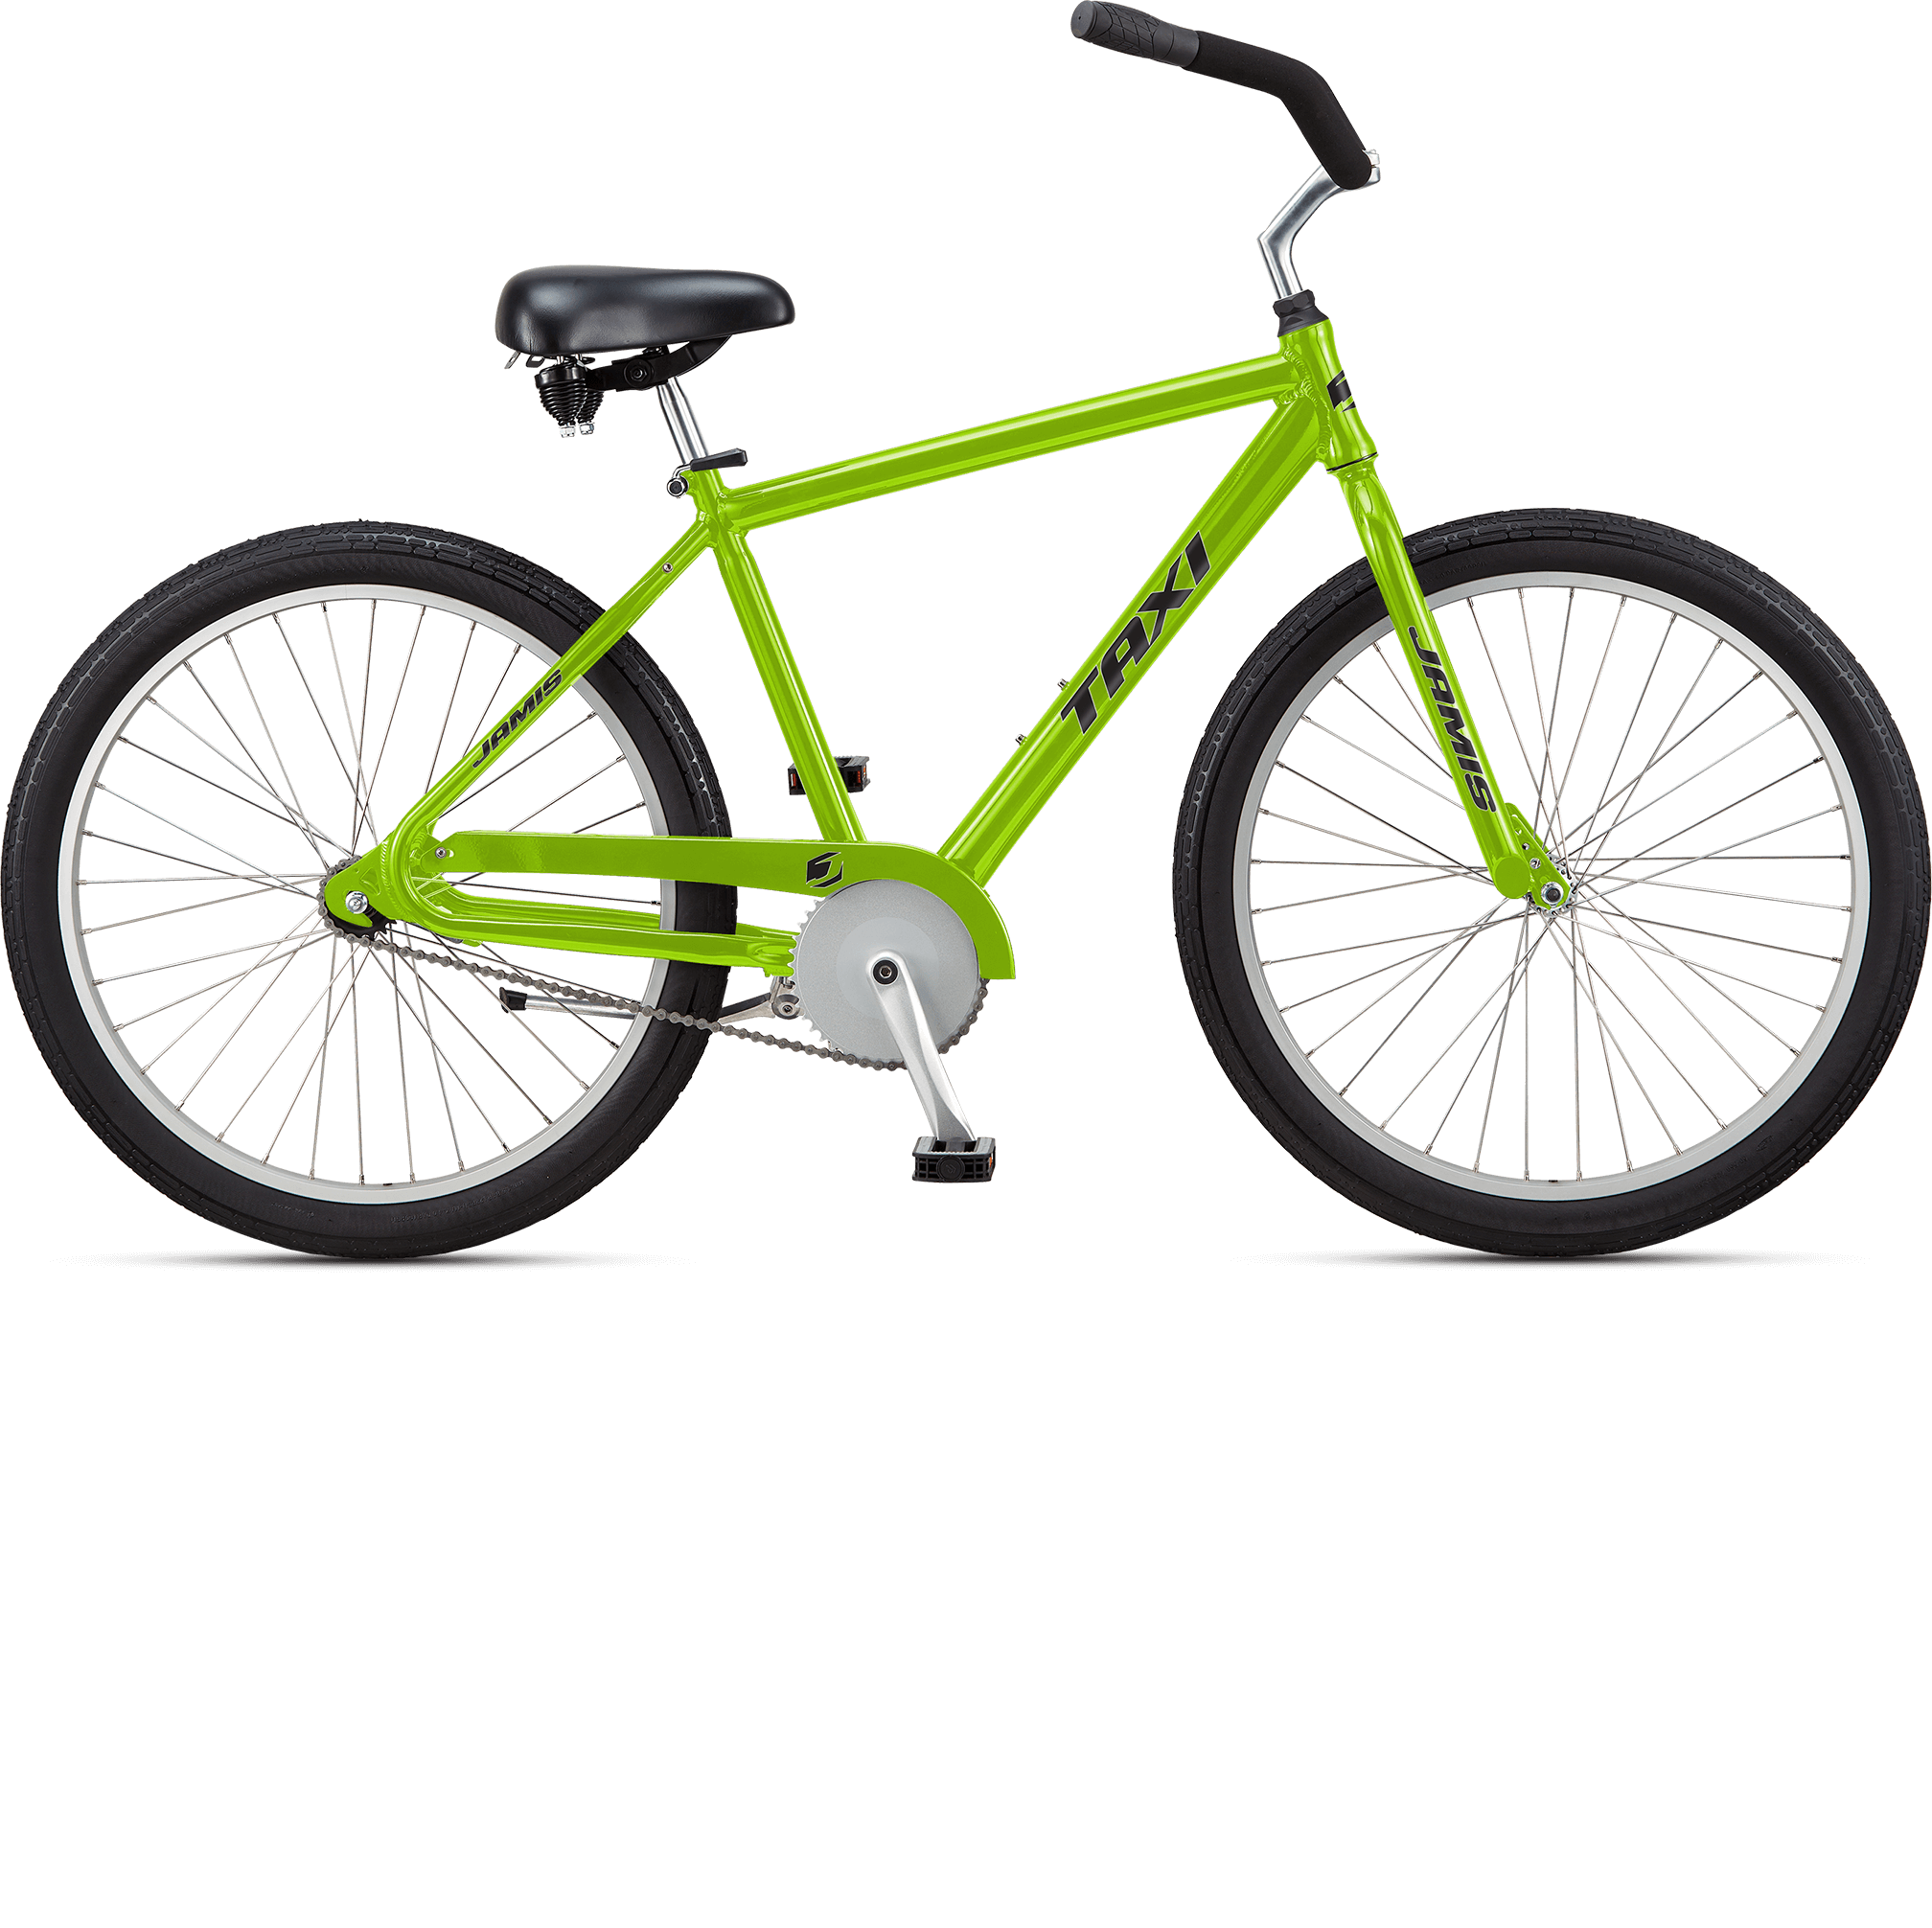 "Bikes Jamis Adult 26"" Cruiser Bike -Unisex"